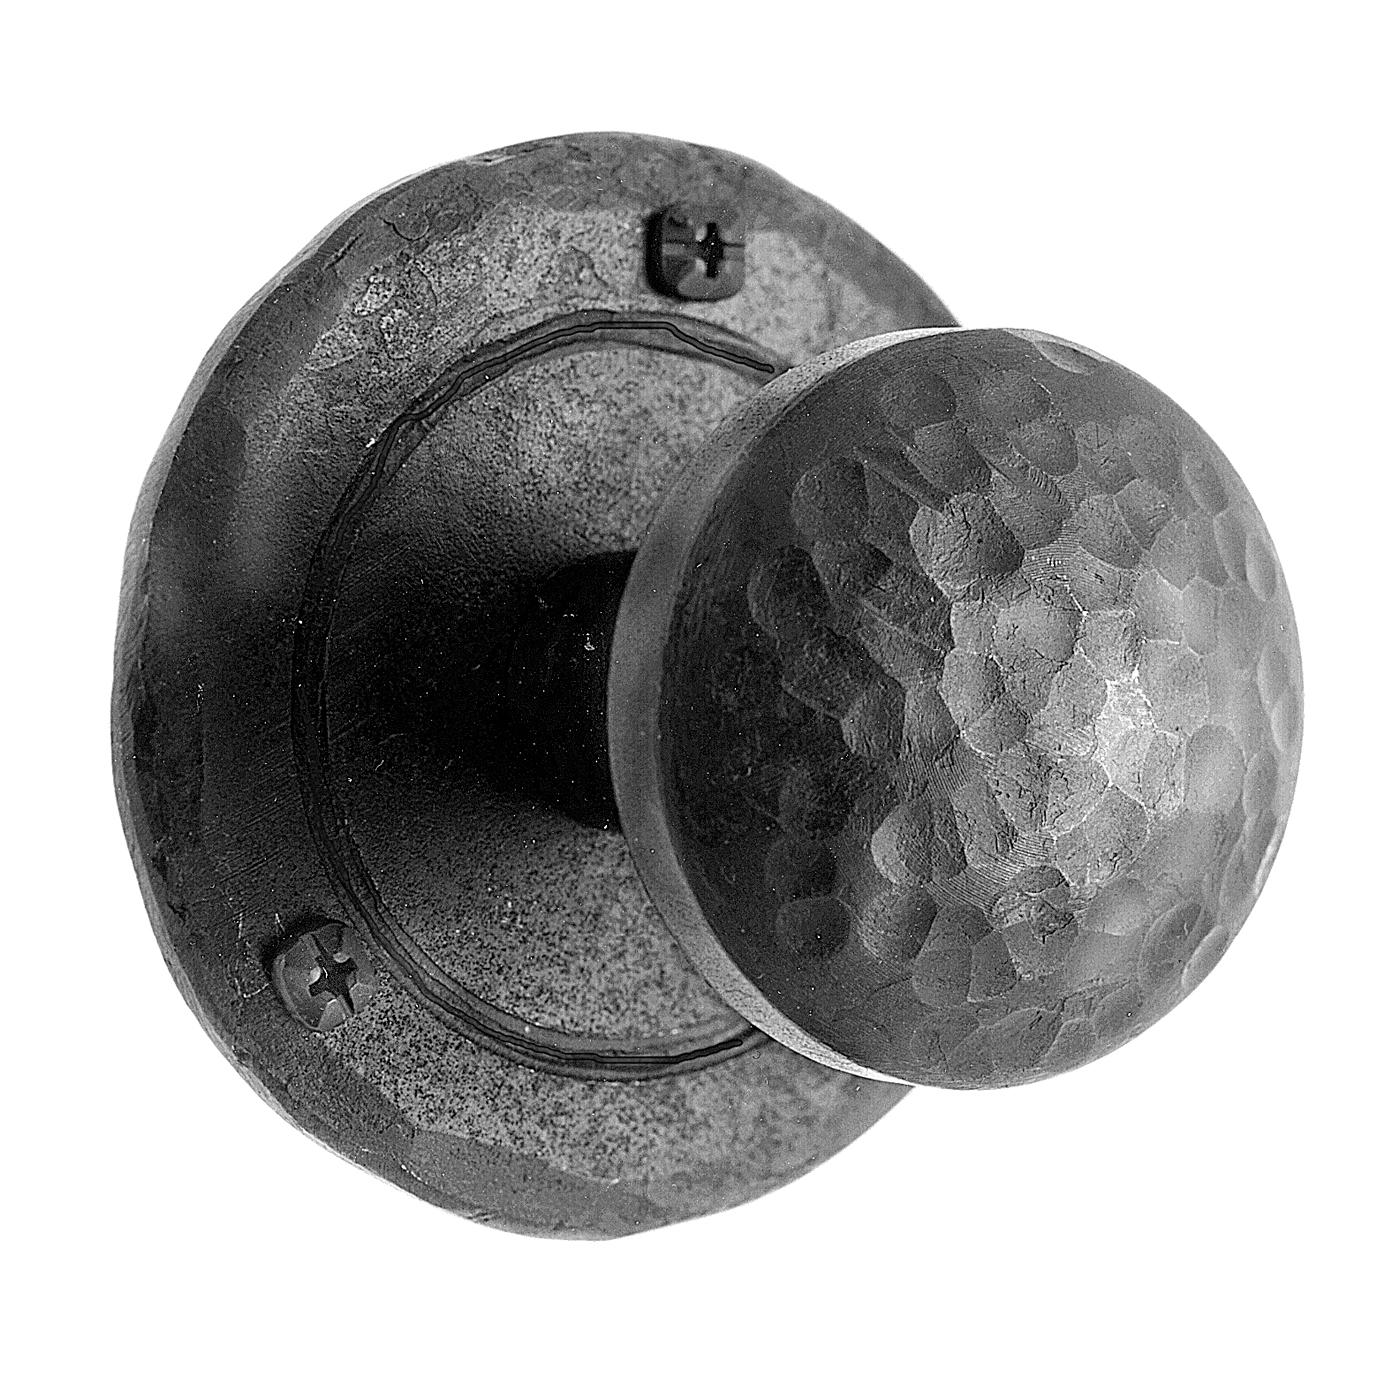 iron door knobs photo - 1